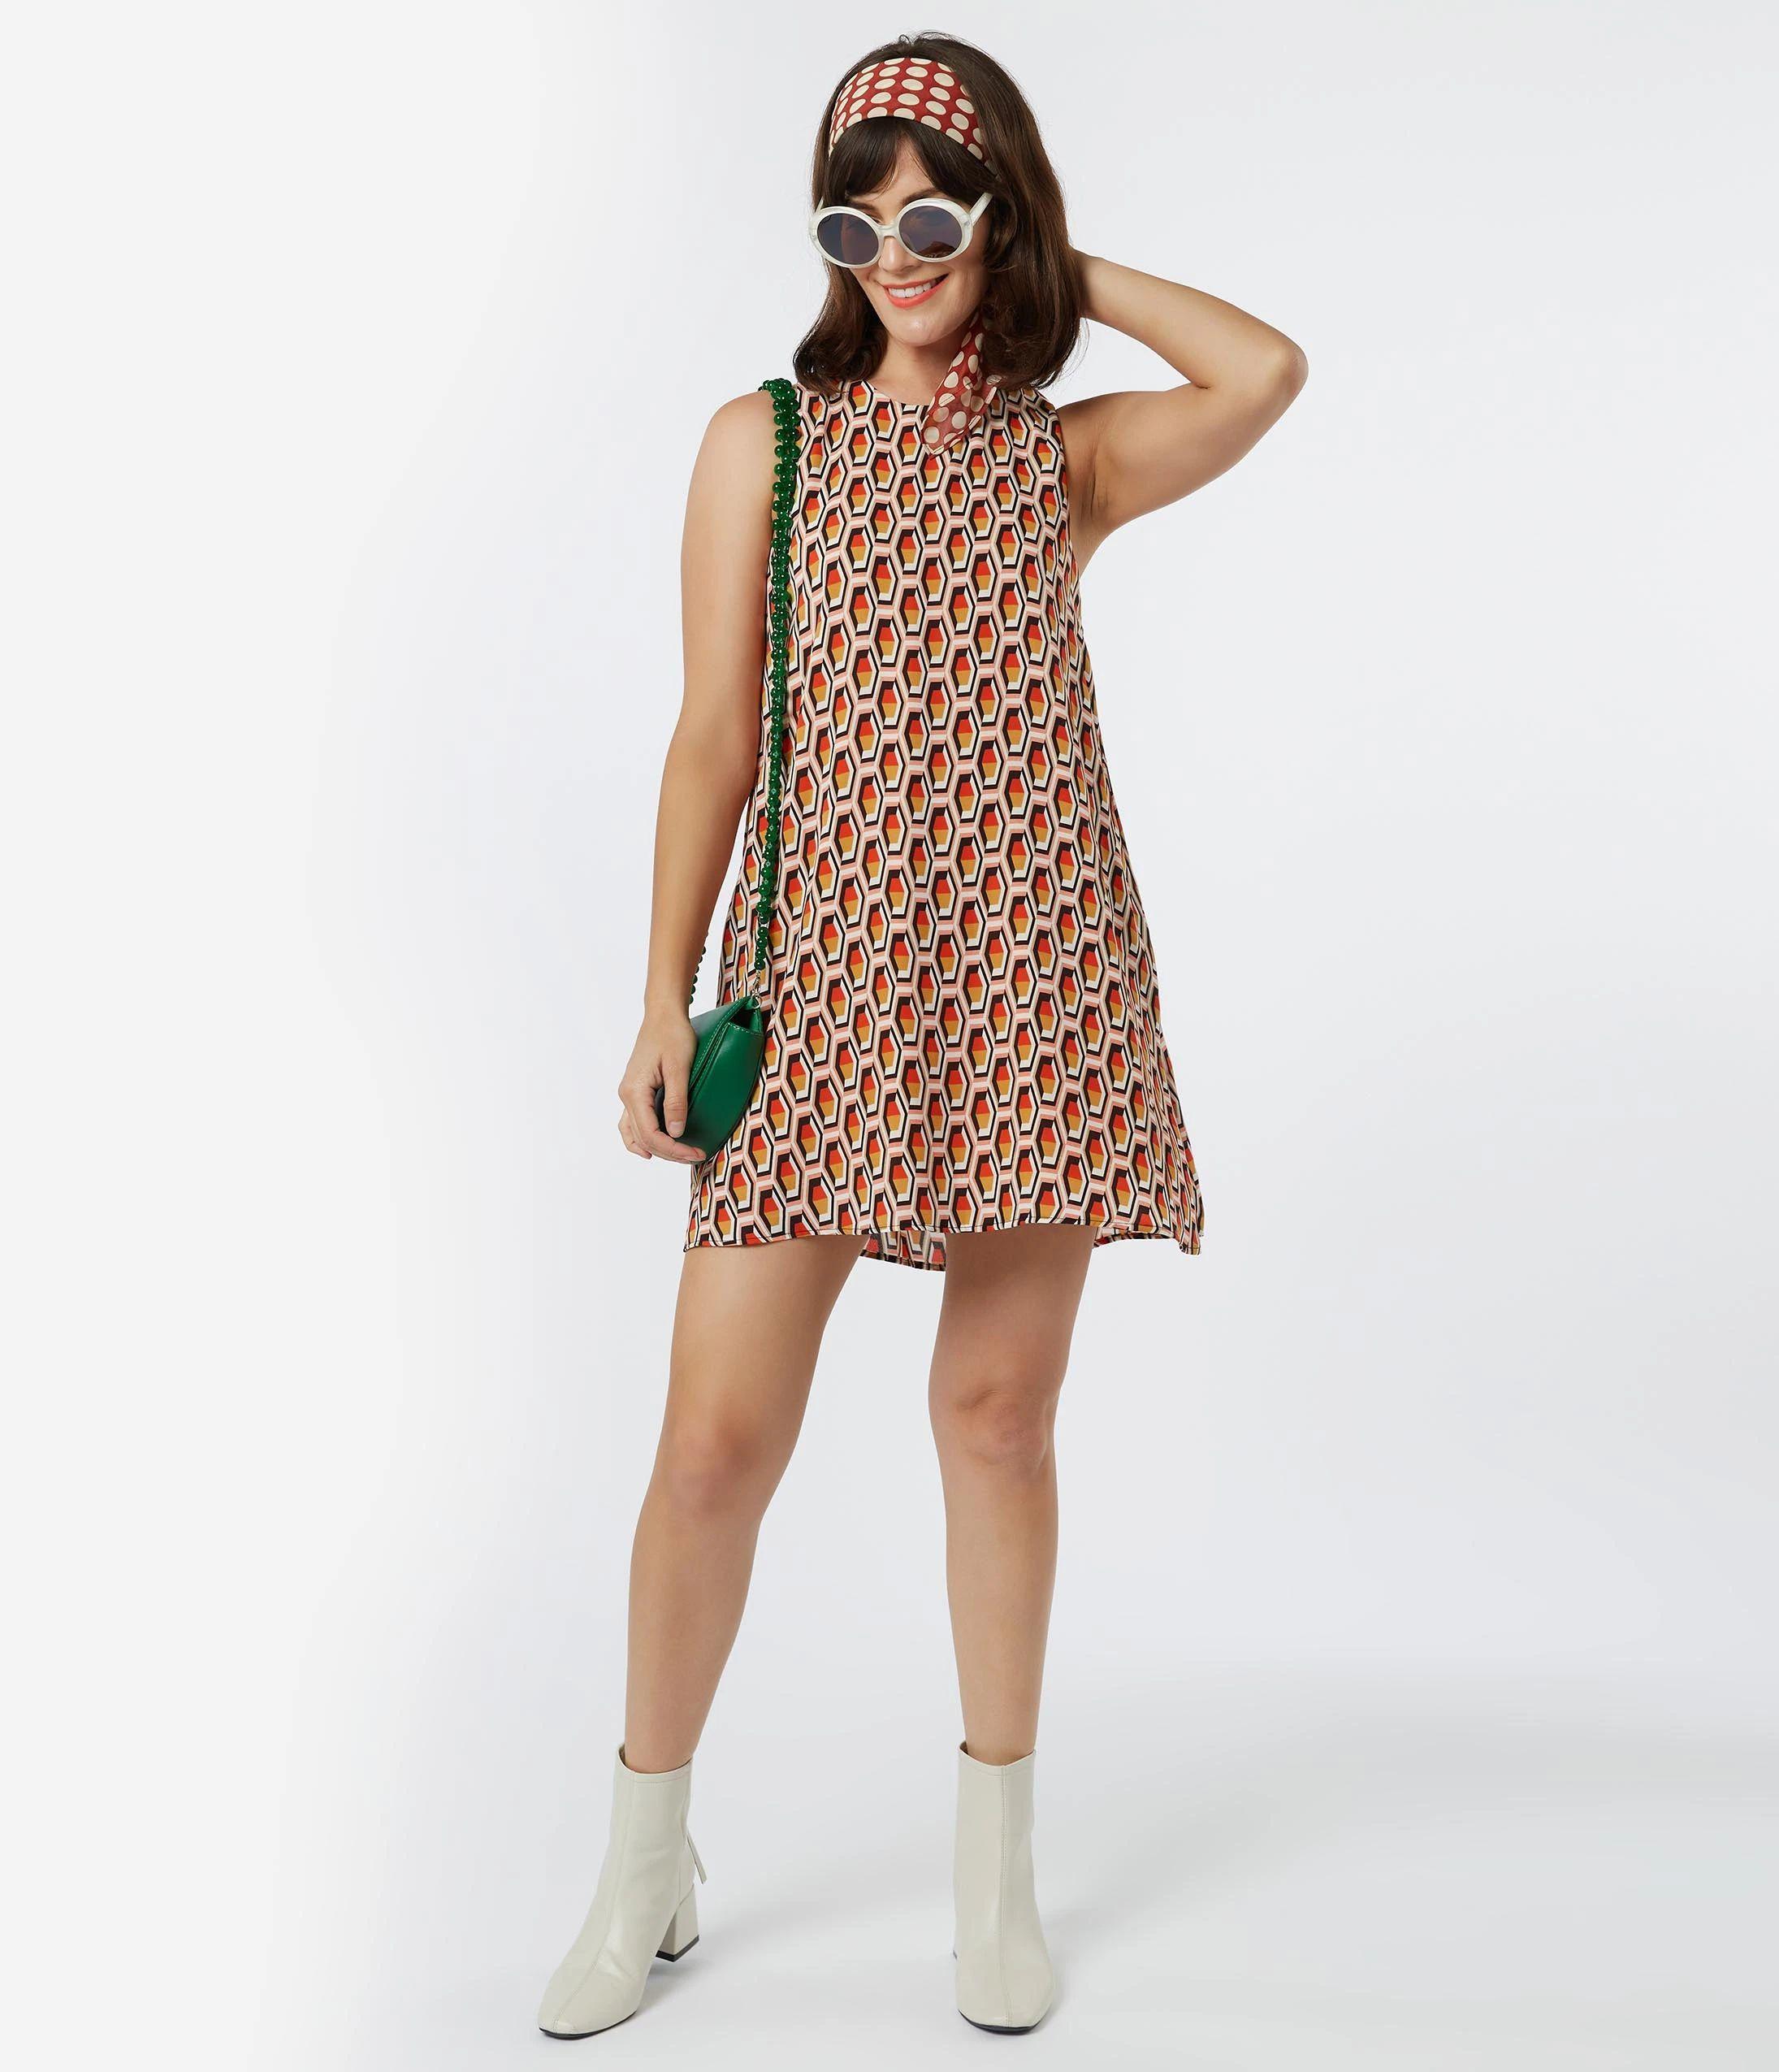 60s Dresses 1960s Dresses Mod Mini Hippie 1960s Fashion Printed Shift Dress Shift Dress [ 2550 x 2190 Pixel ]